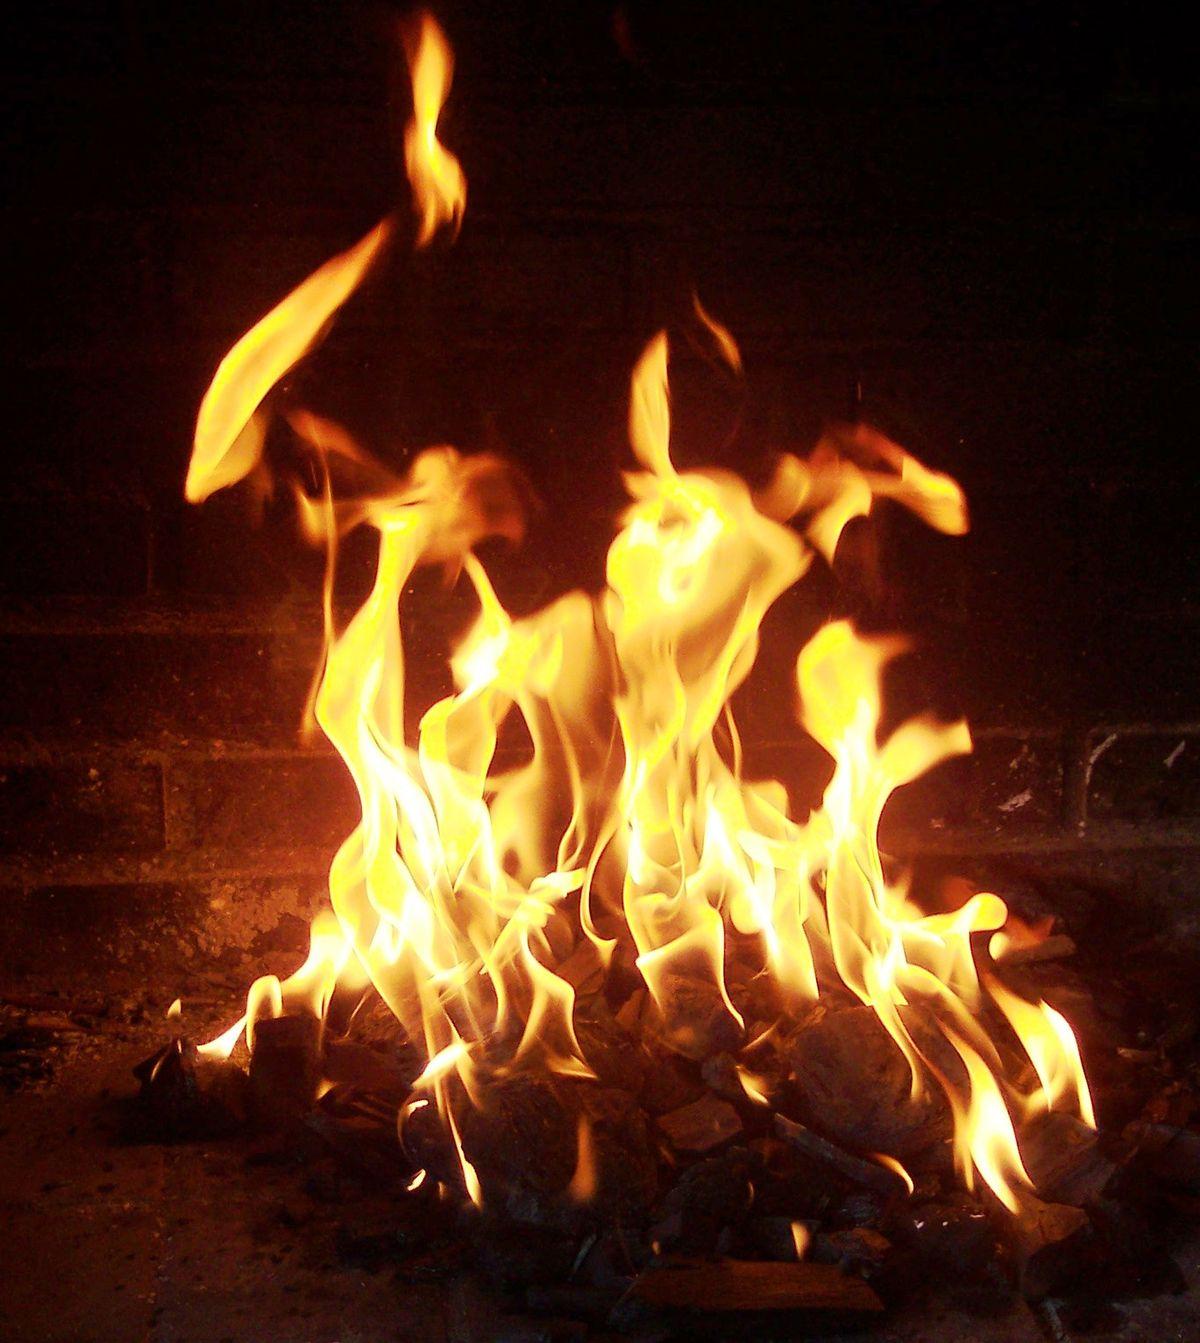 Fireplace Gif Living Room